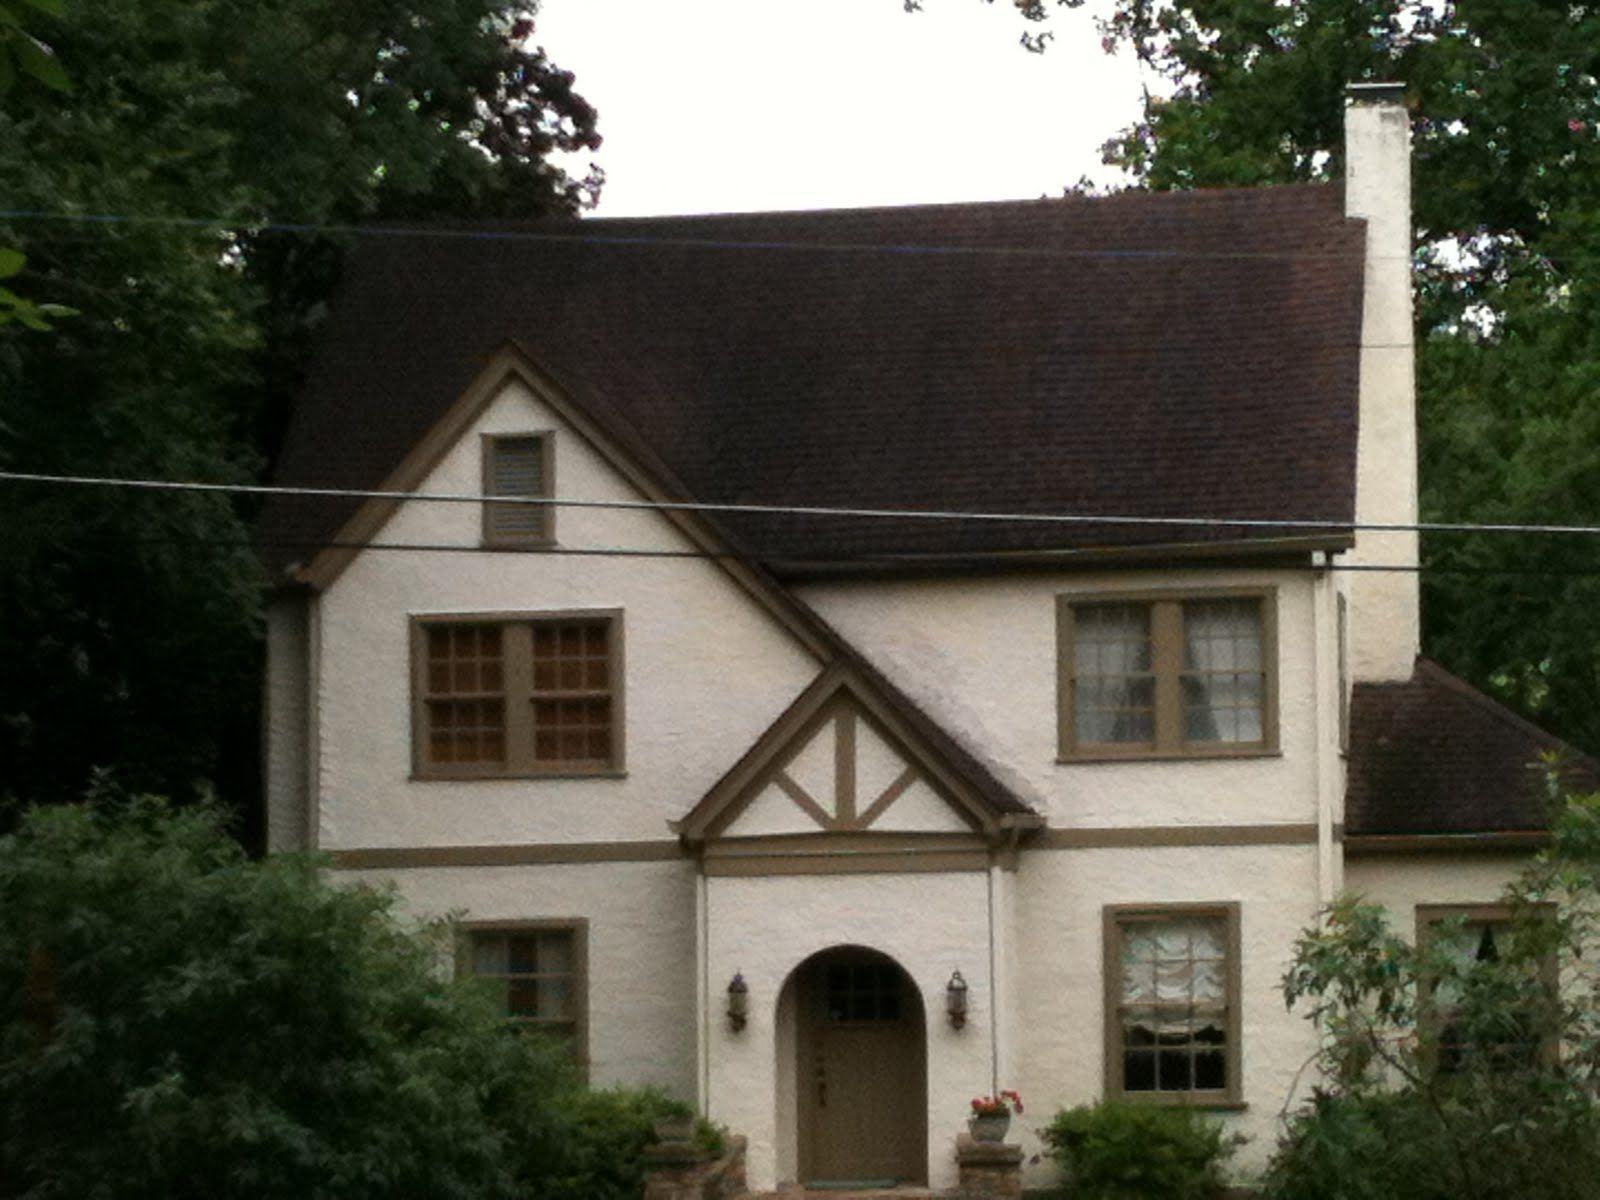 Light Brown House With Dark Trim